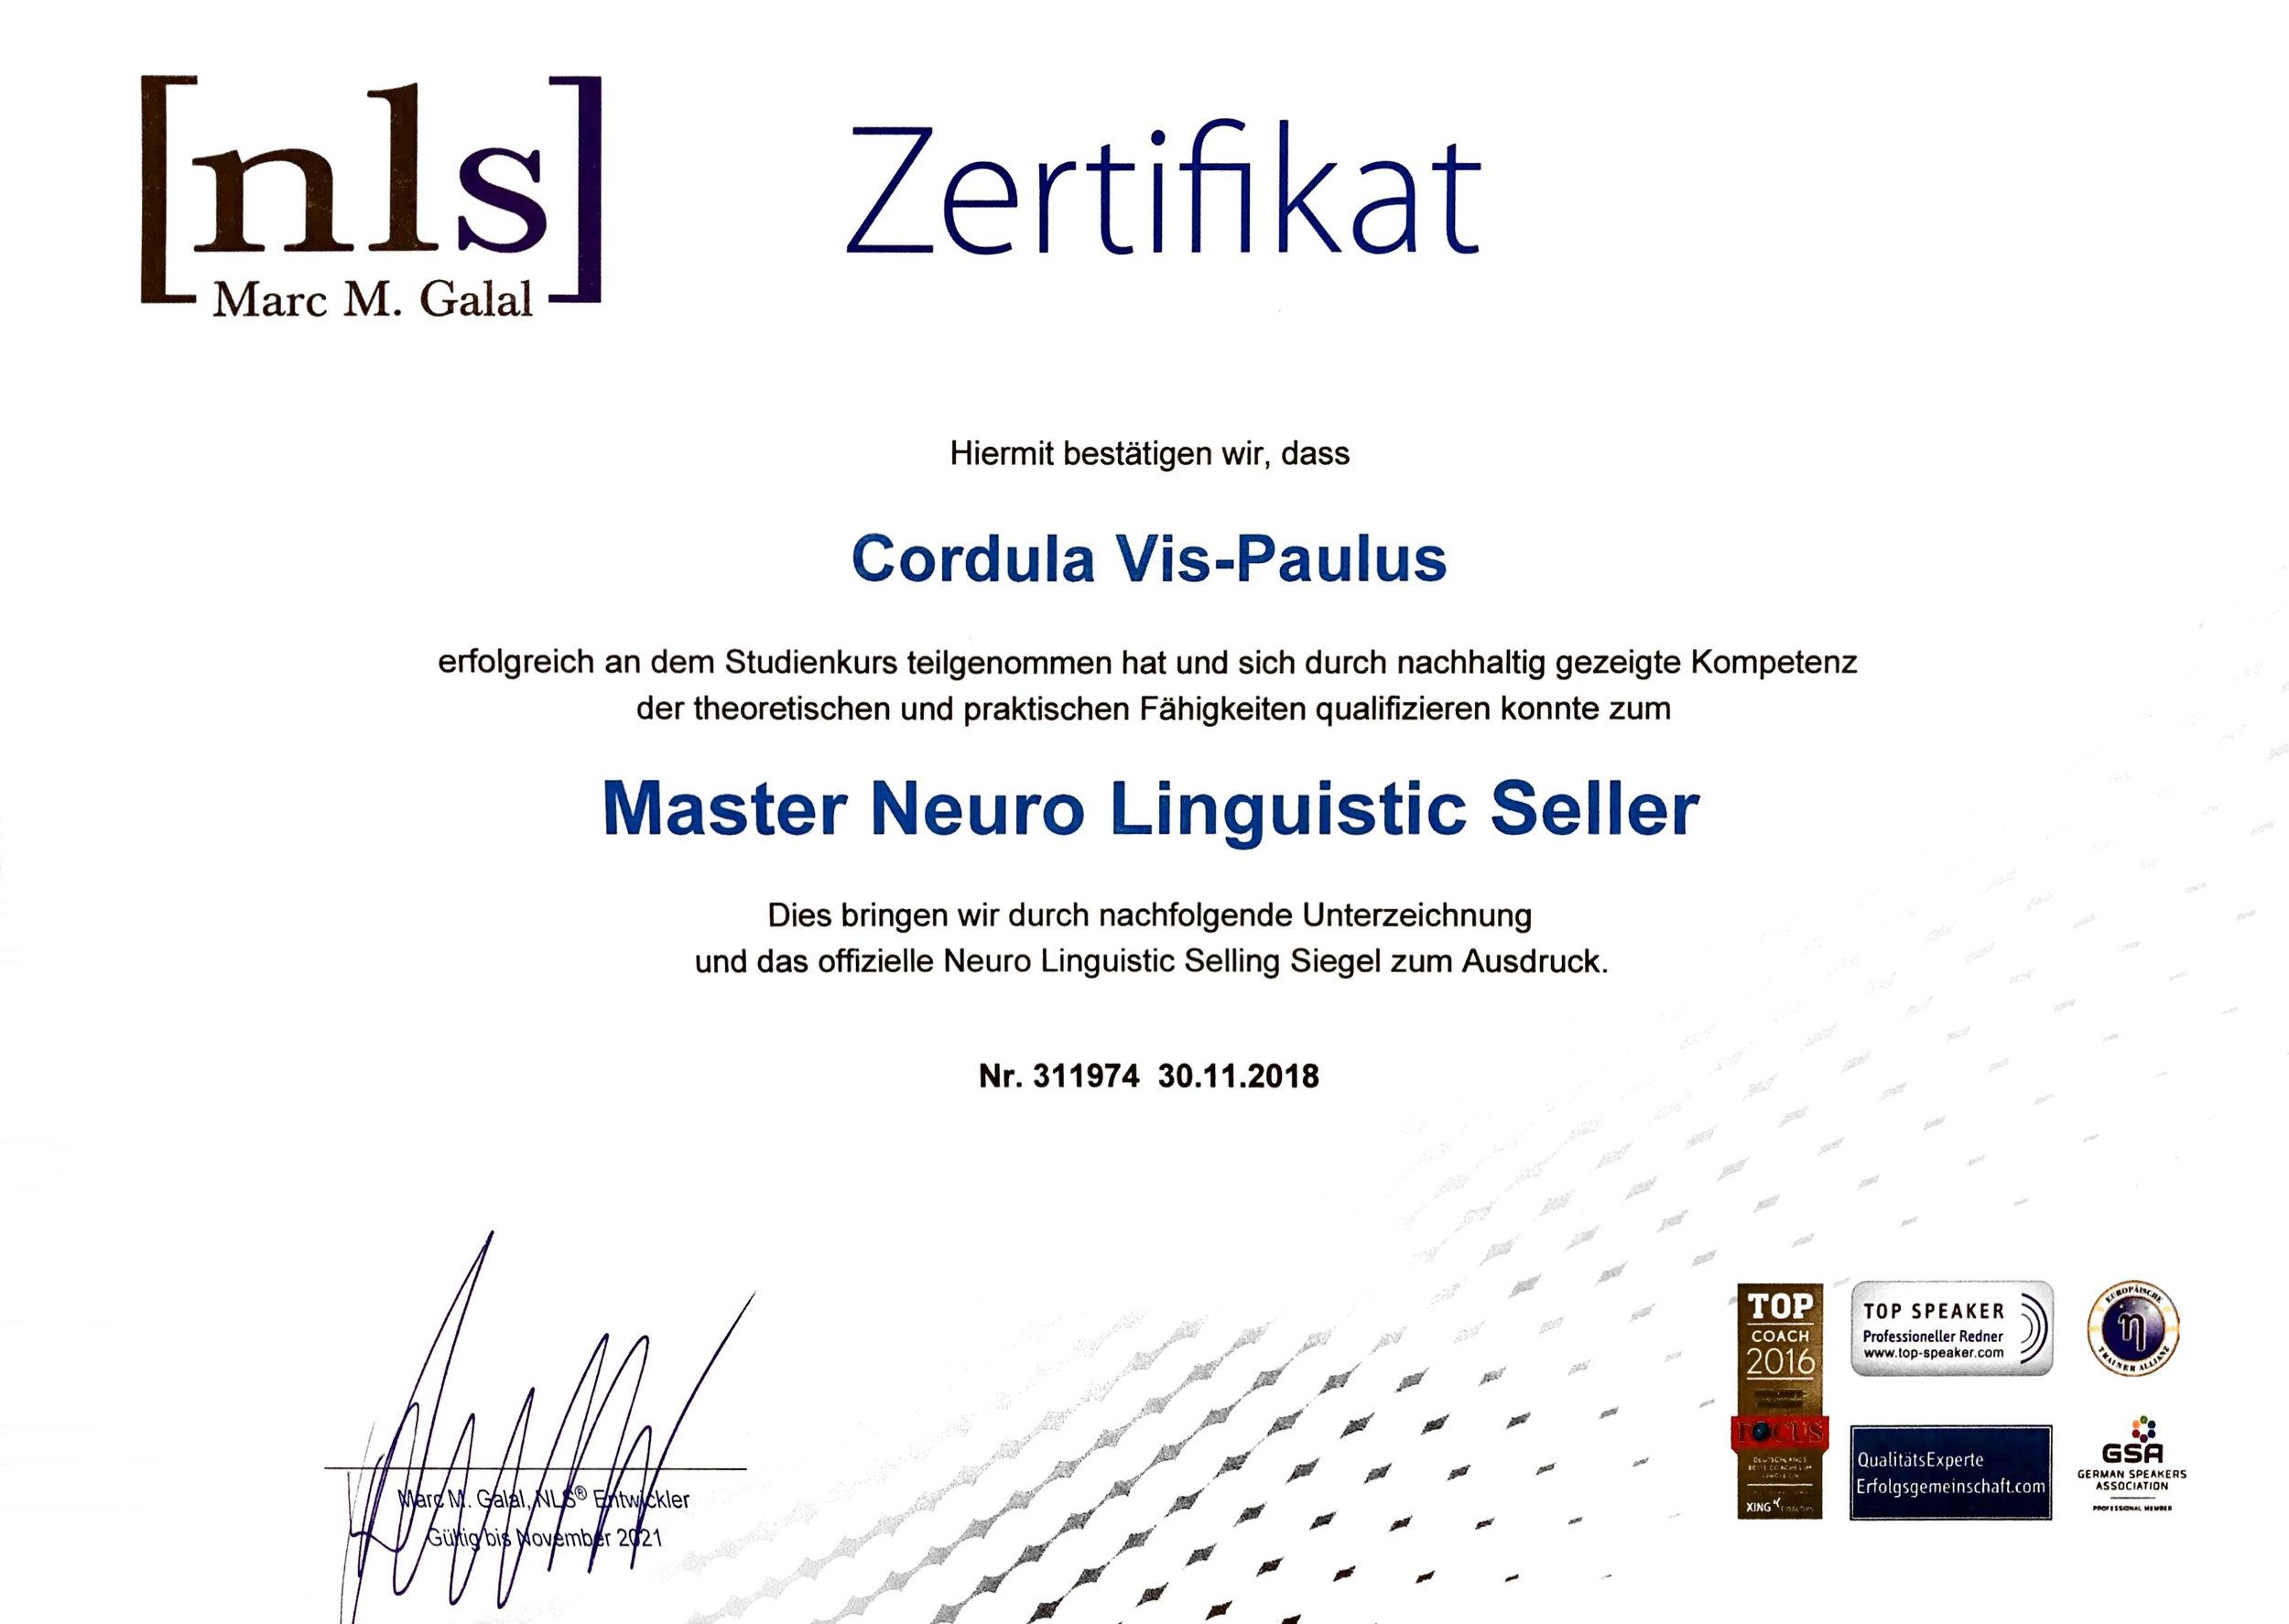 Master Neuro Linguistic Seller – NLS